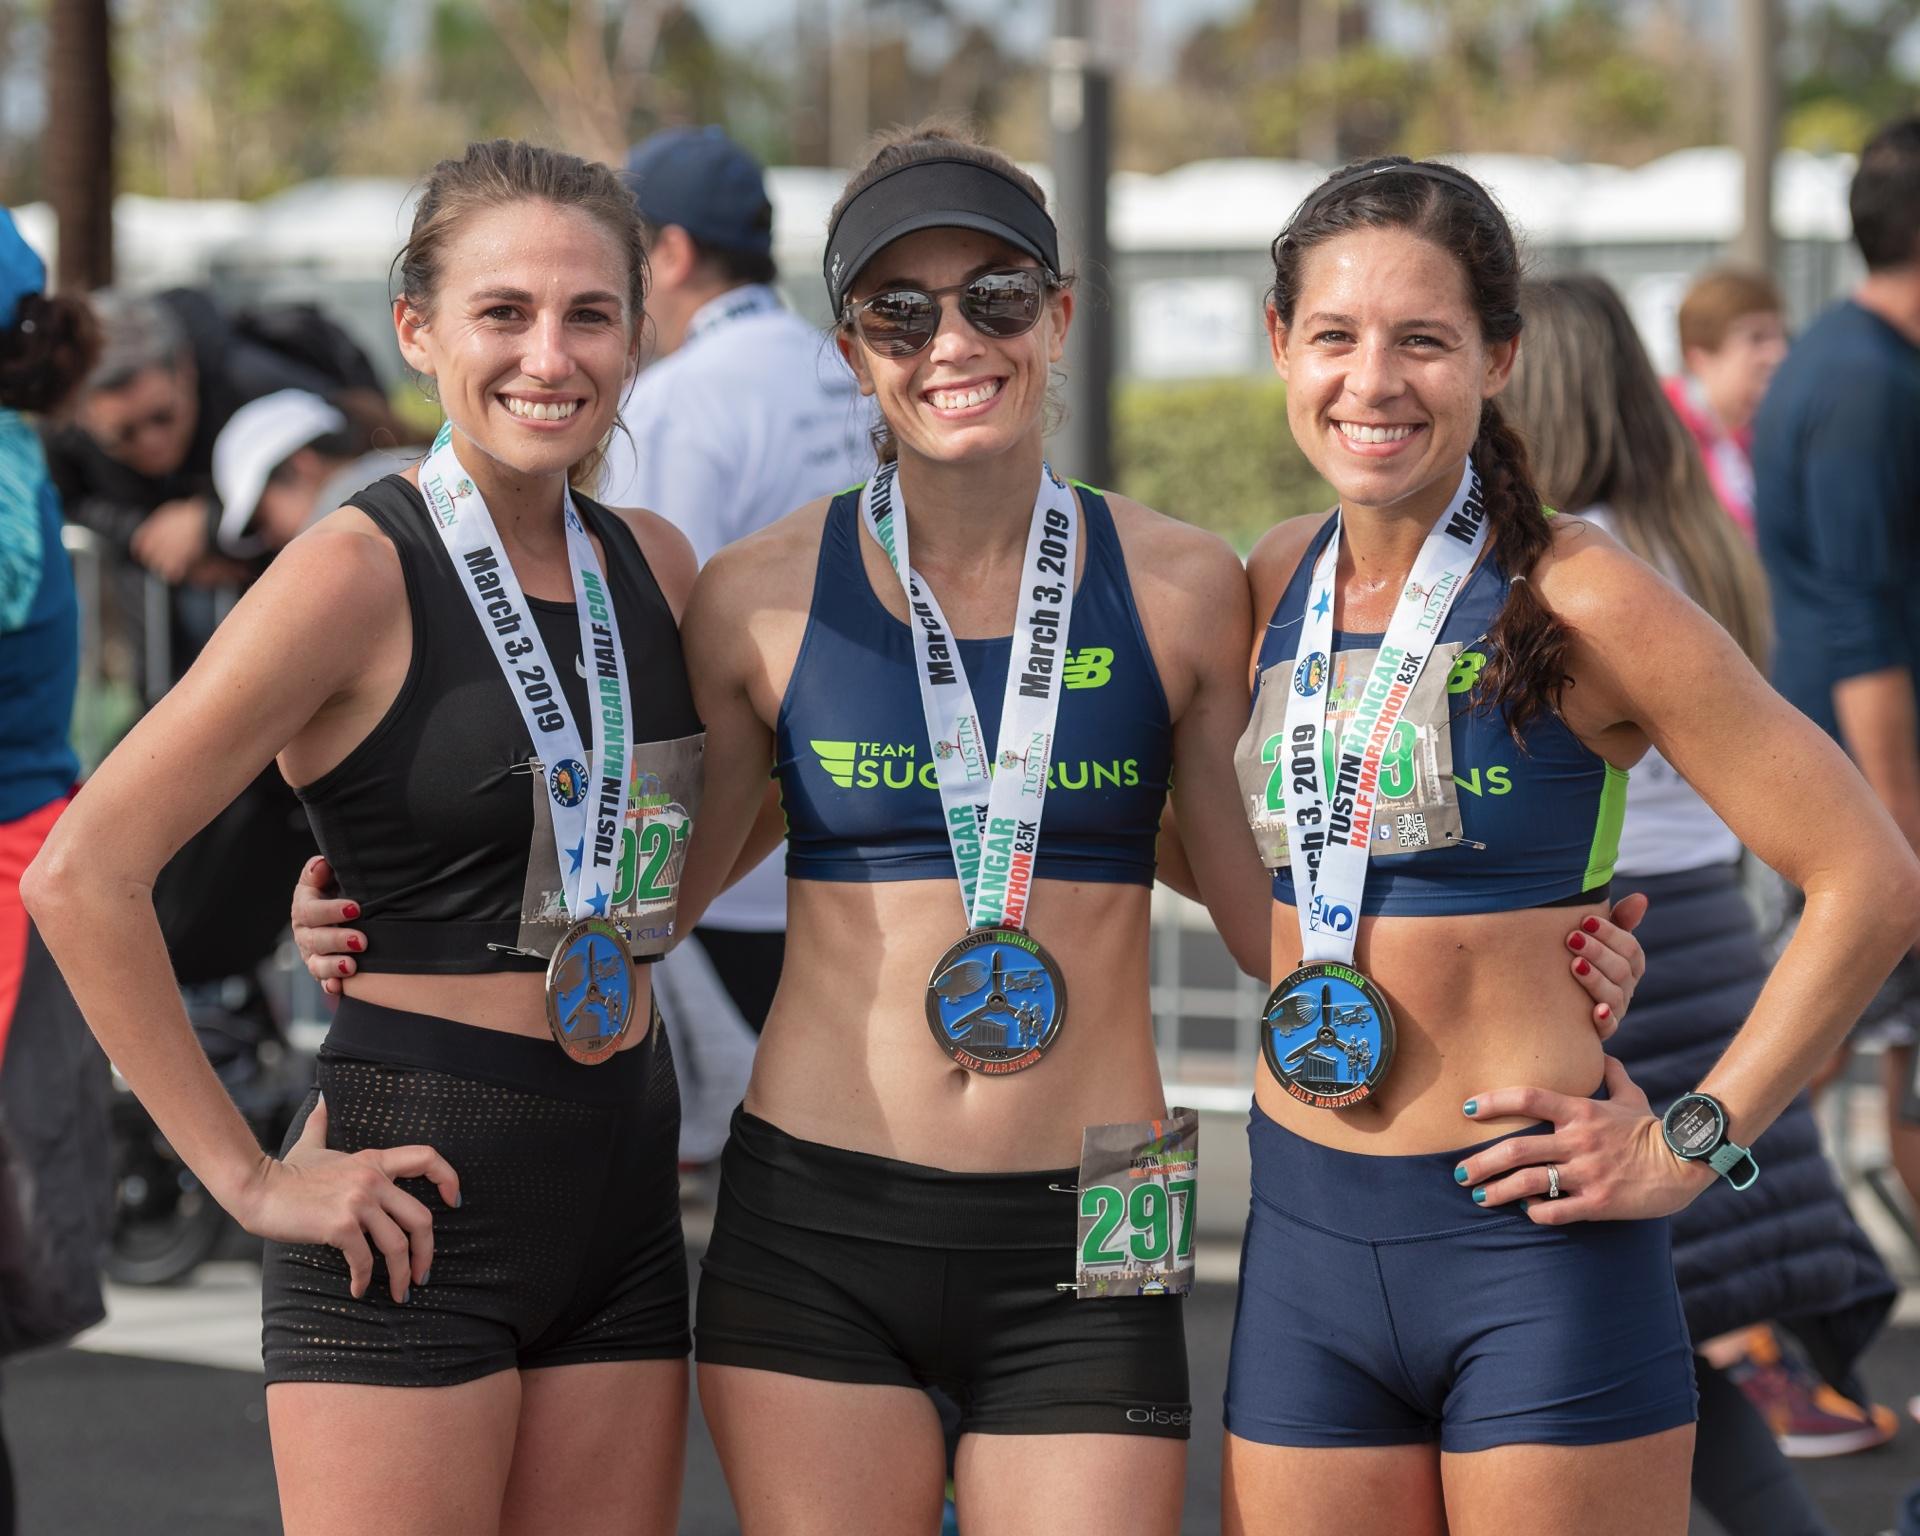 Team Sugar Runs @ Tustin Half Marathon 2019